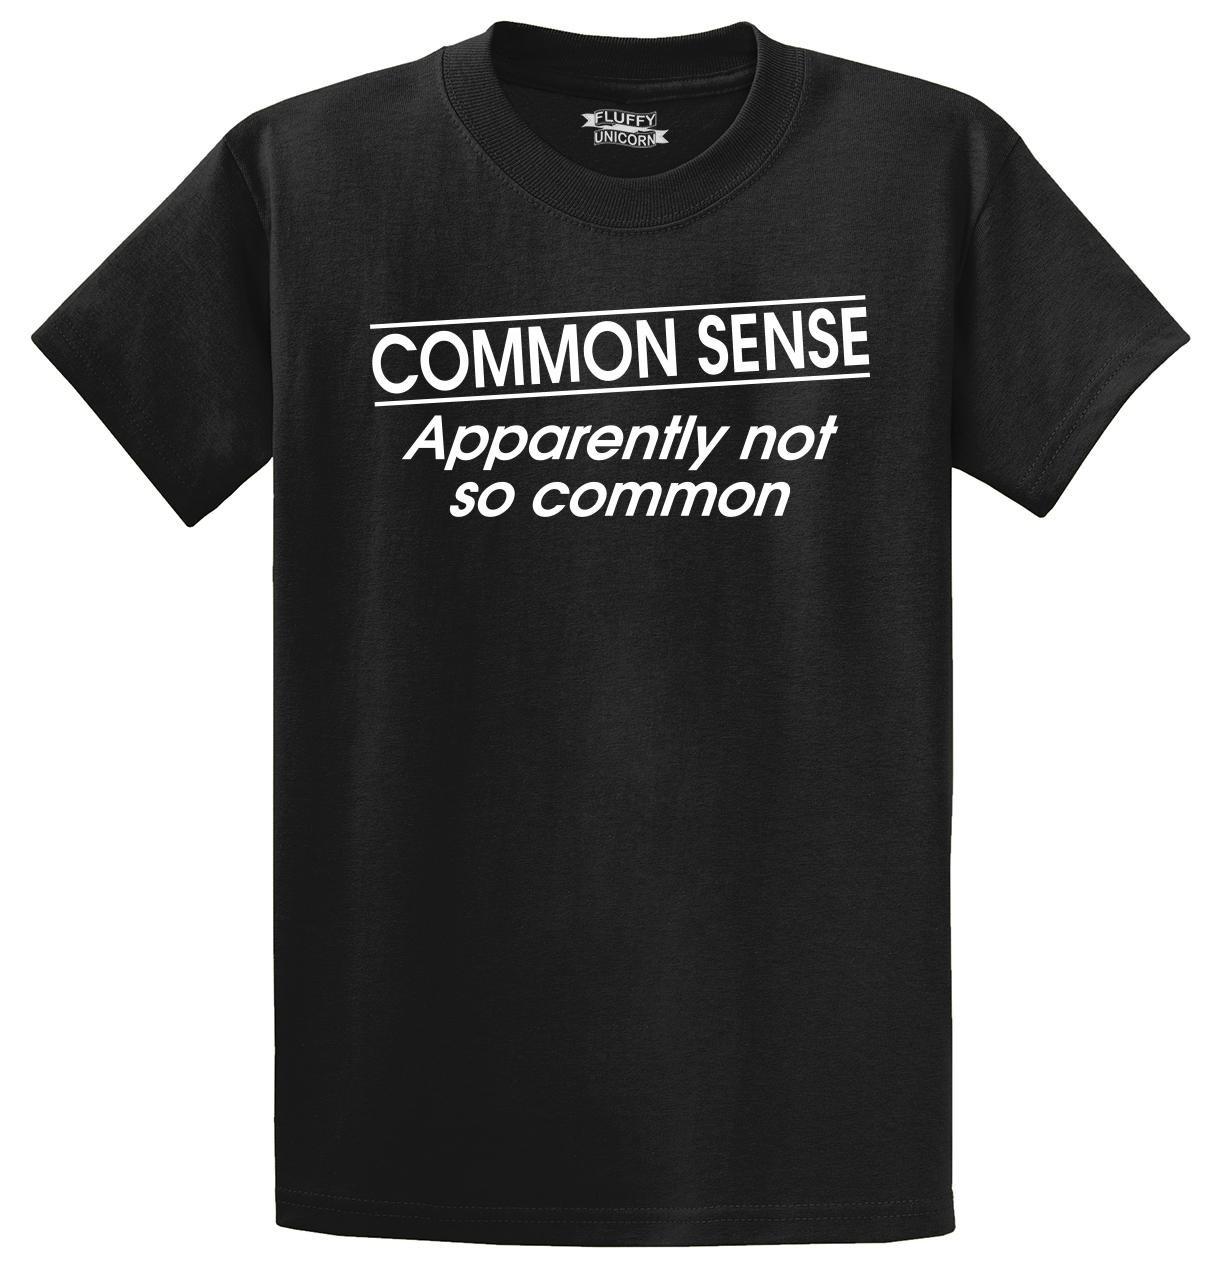 S Common Sense Not So Common T Shirt